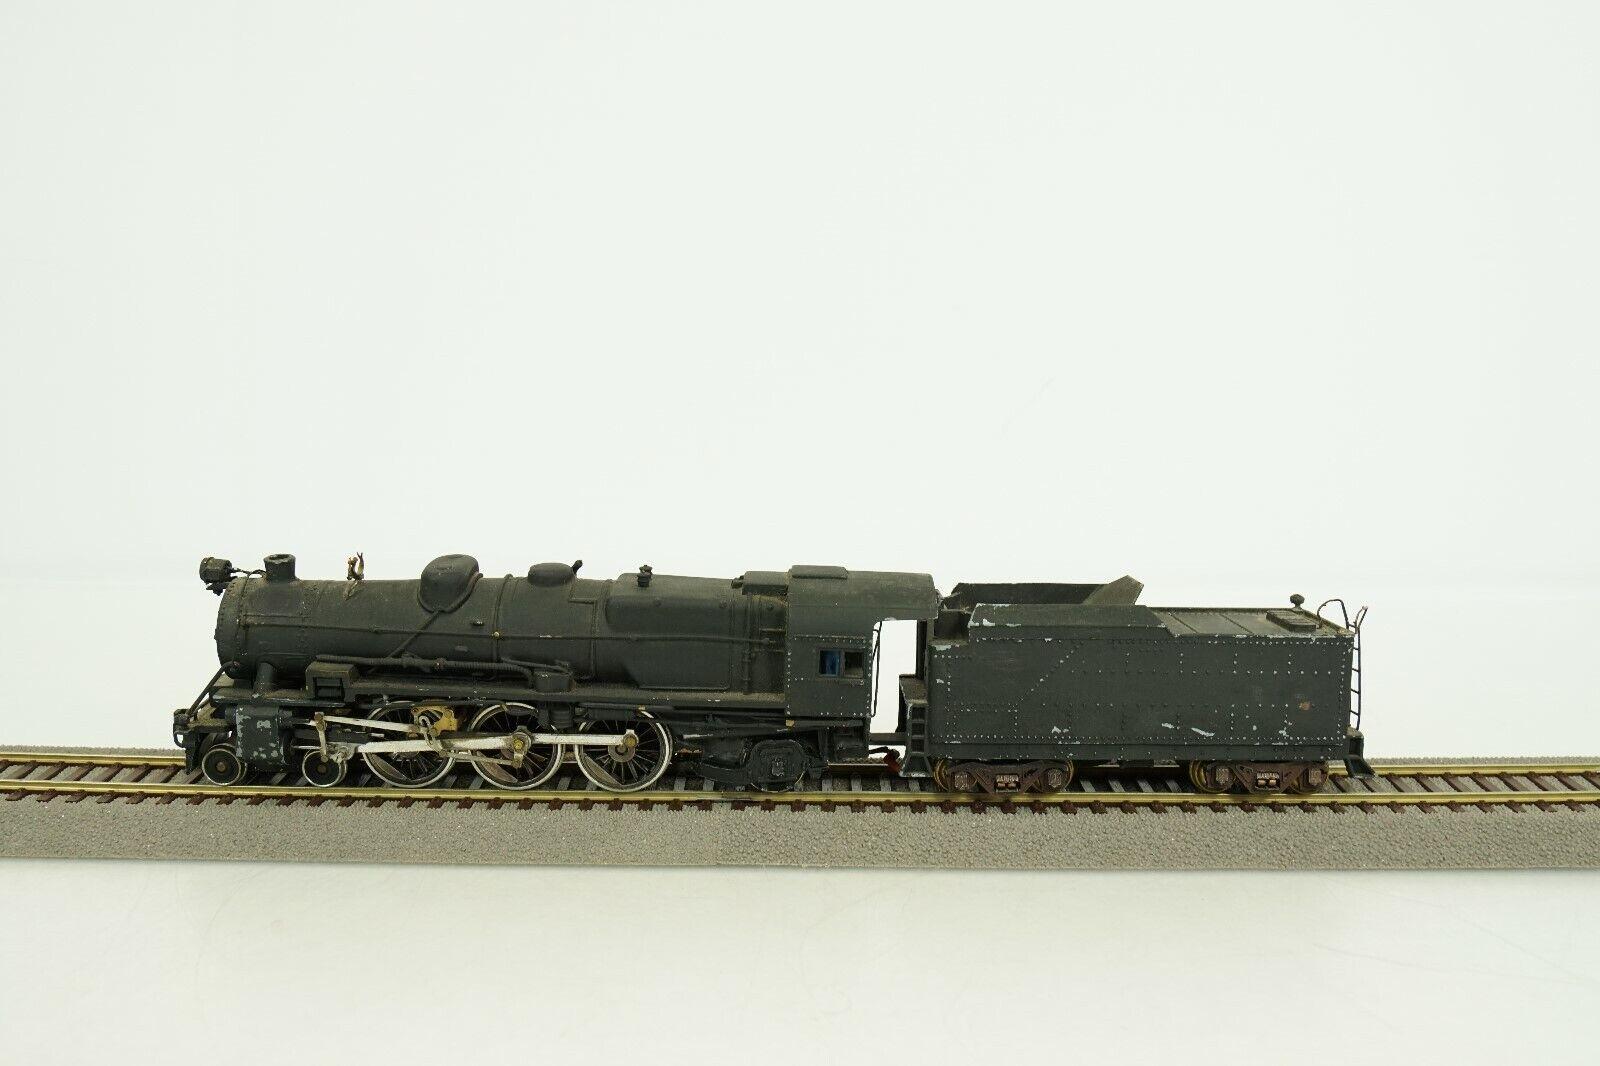 Penn Line HO Scale Pennsylvania 4-6-2 Steam Engine and Tender No Go No Box B84